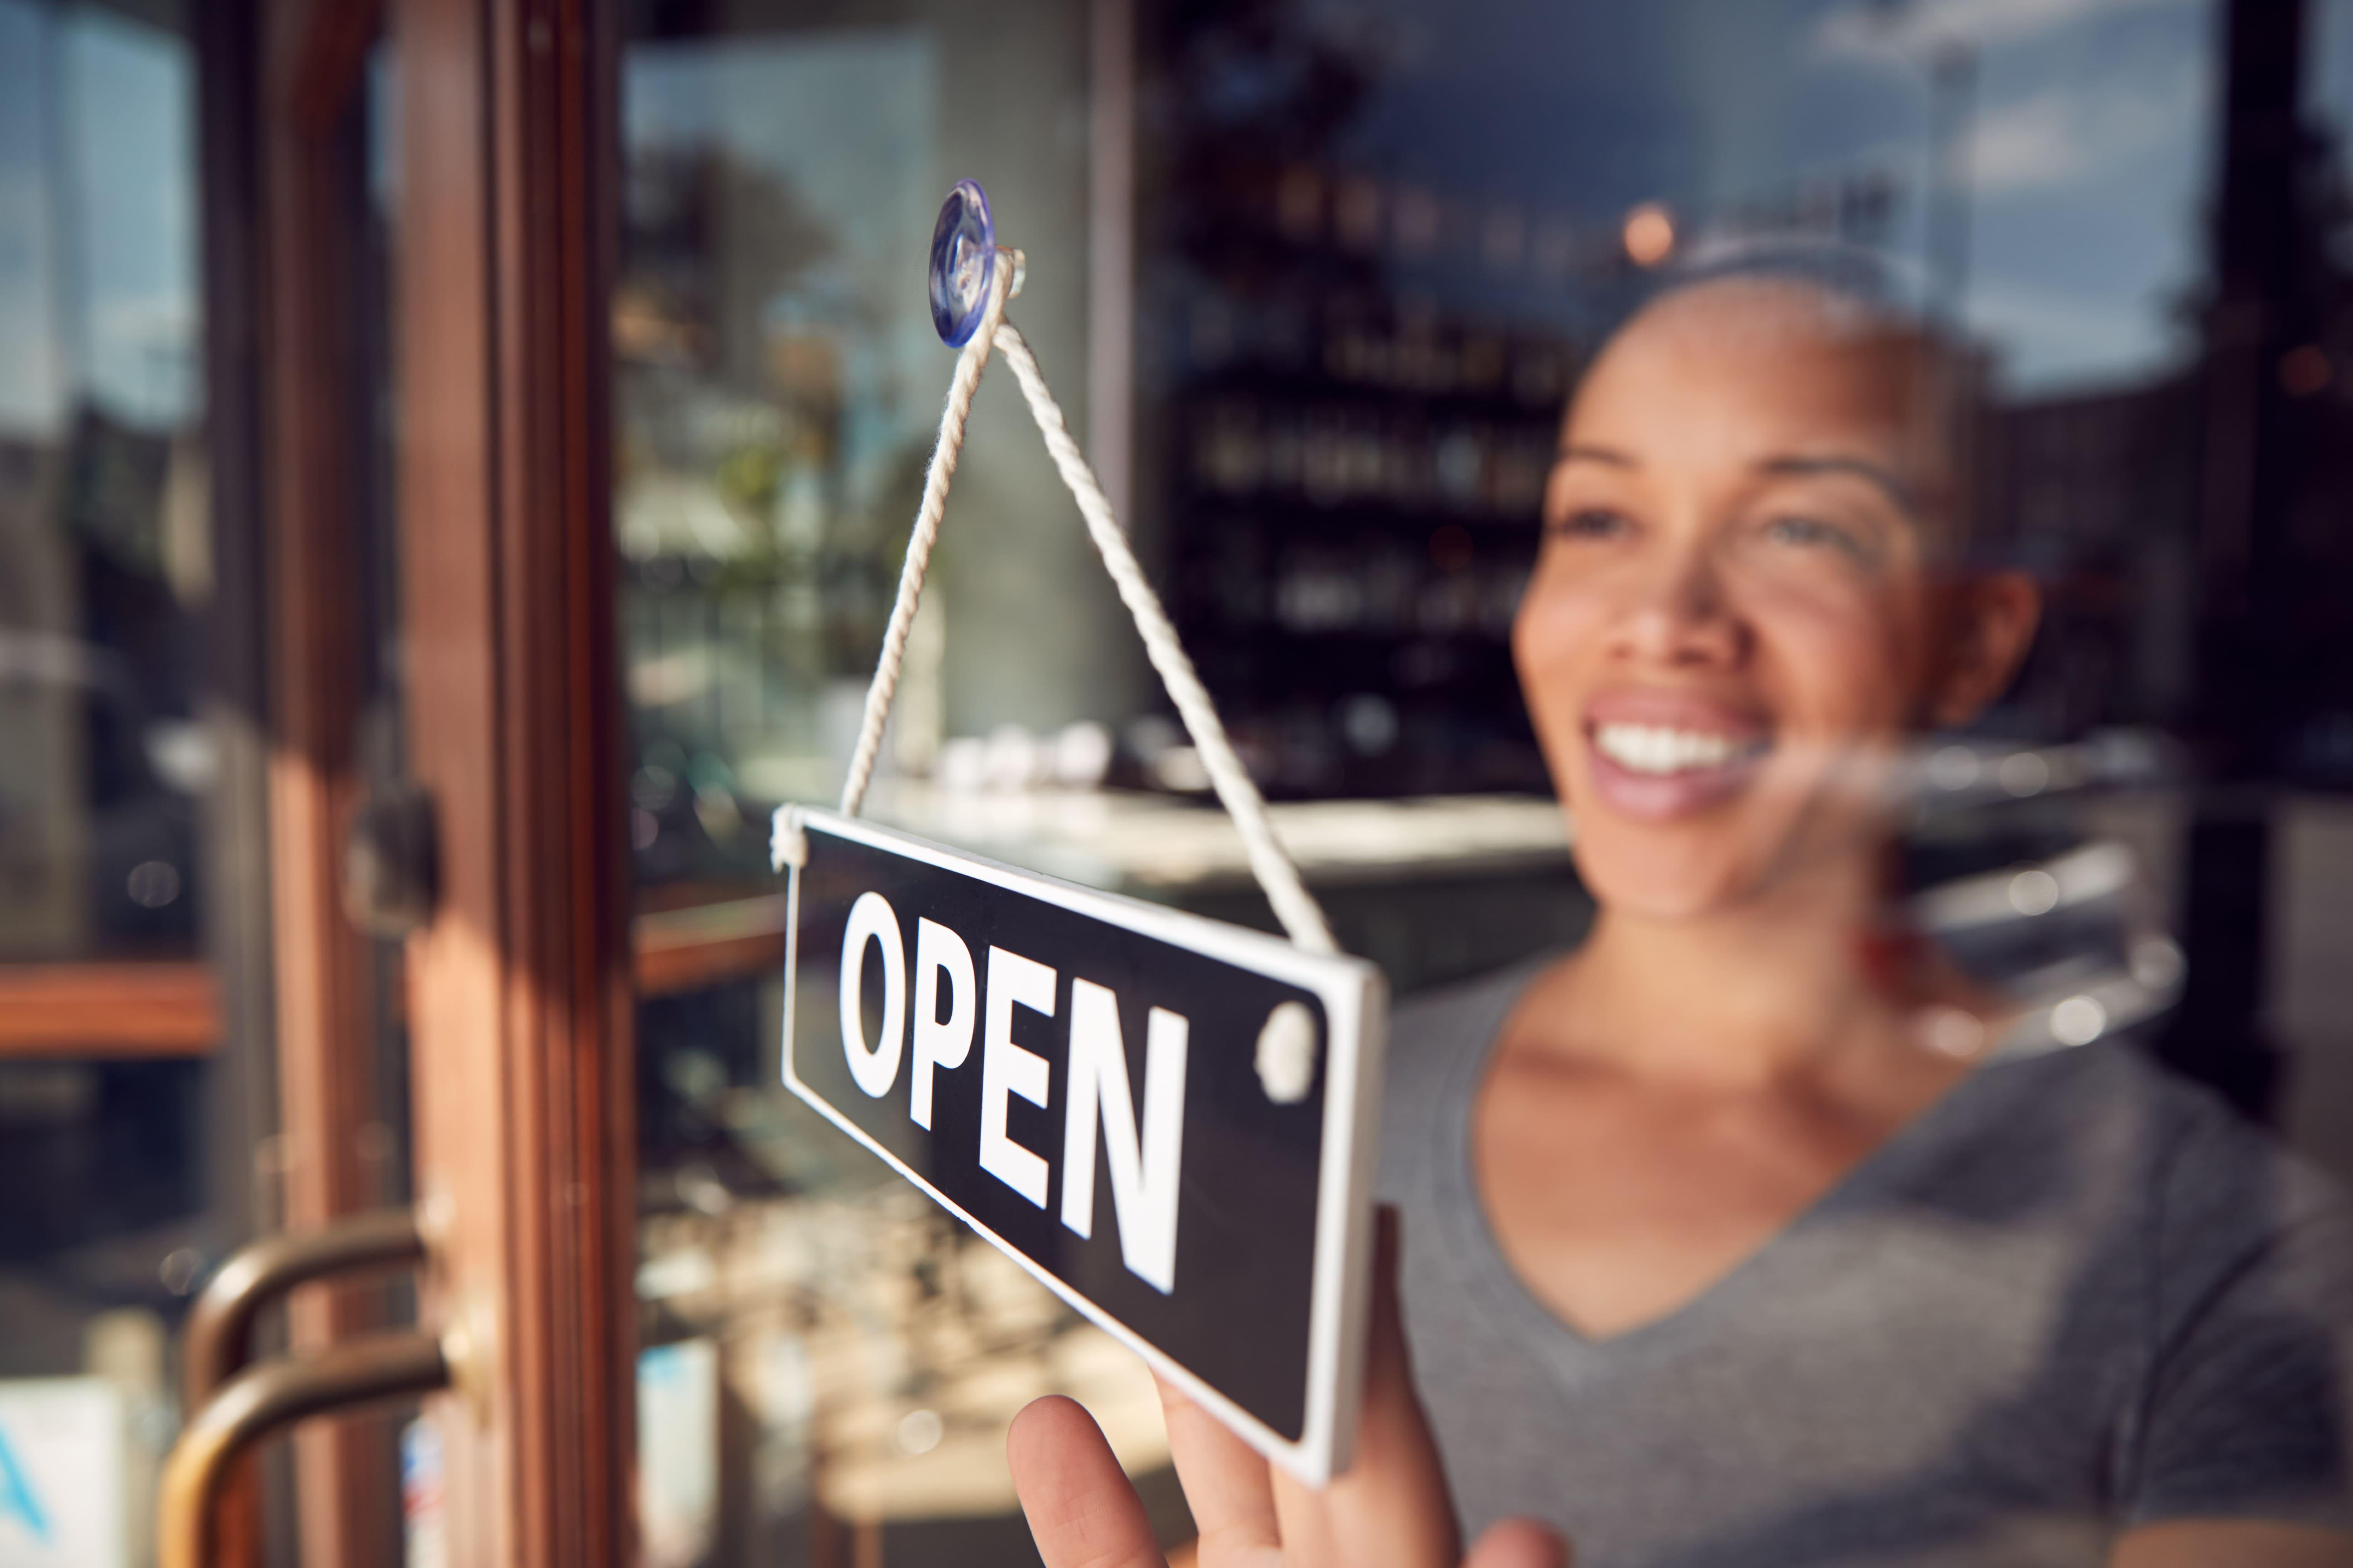 woman opening store - business insurance